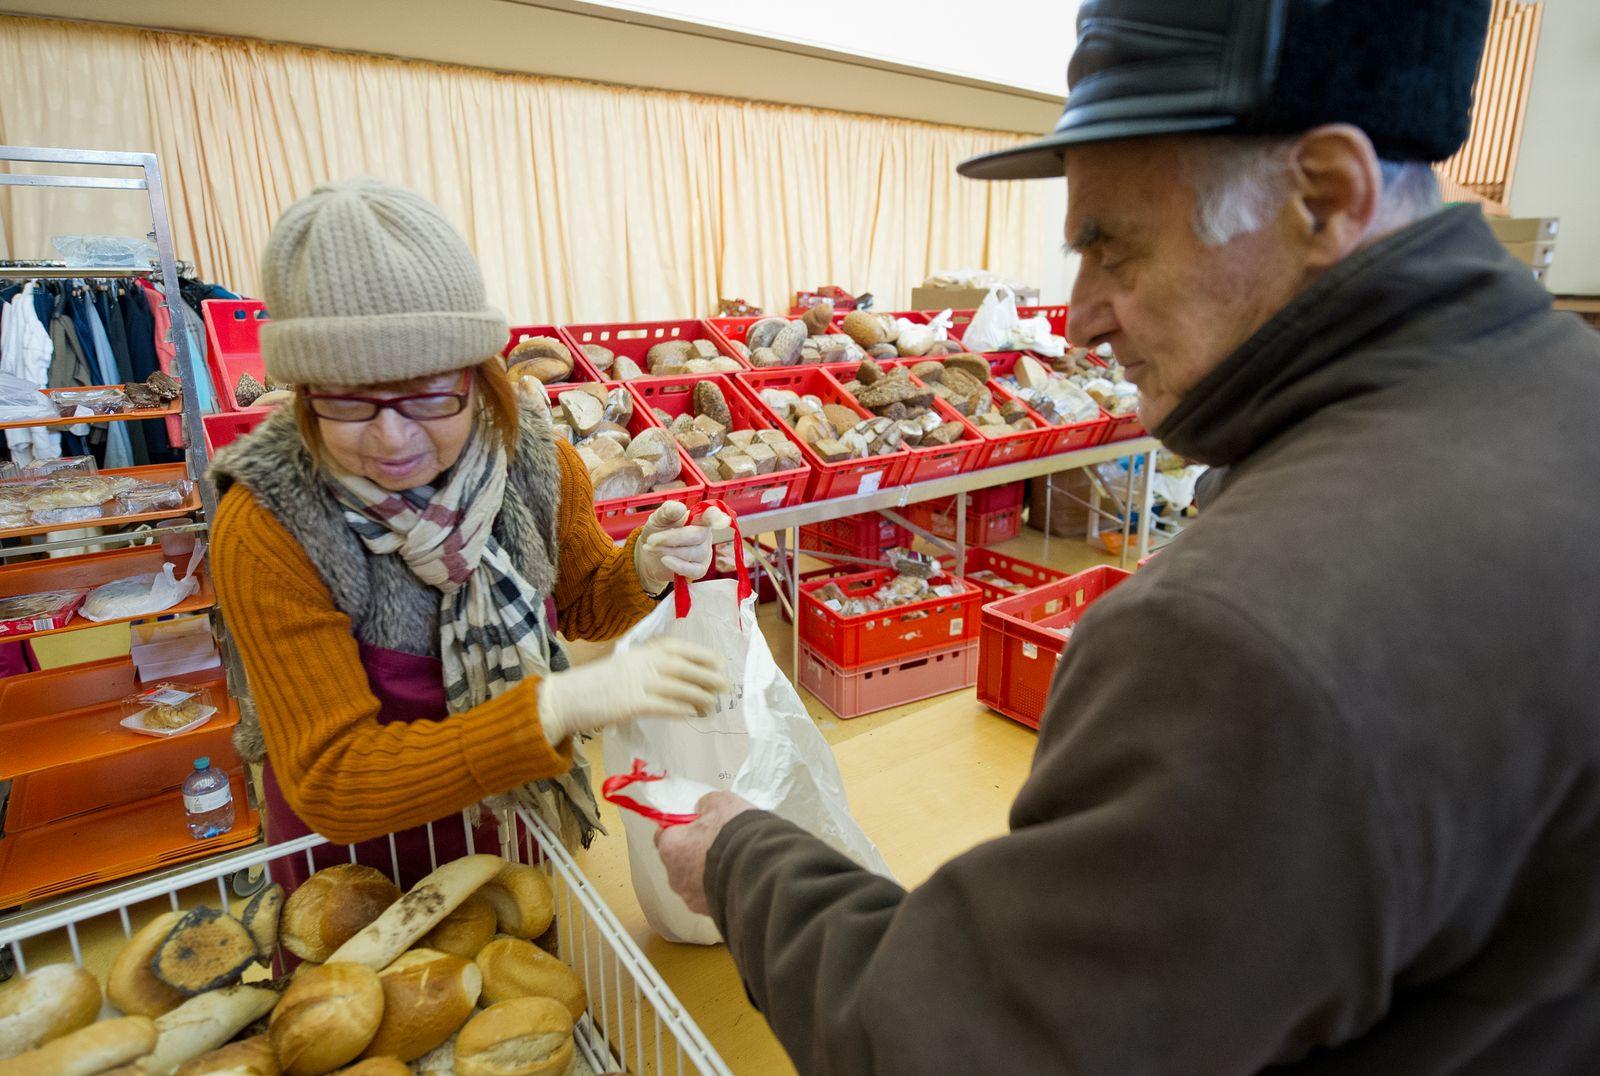 Altersarmut / Armut / Armenküche / Arm / Bedürftige / Suppenküche